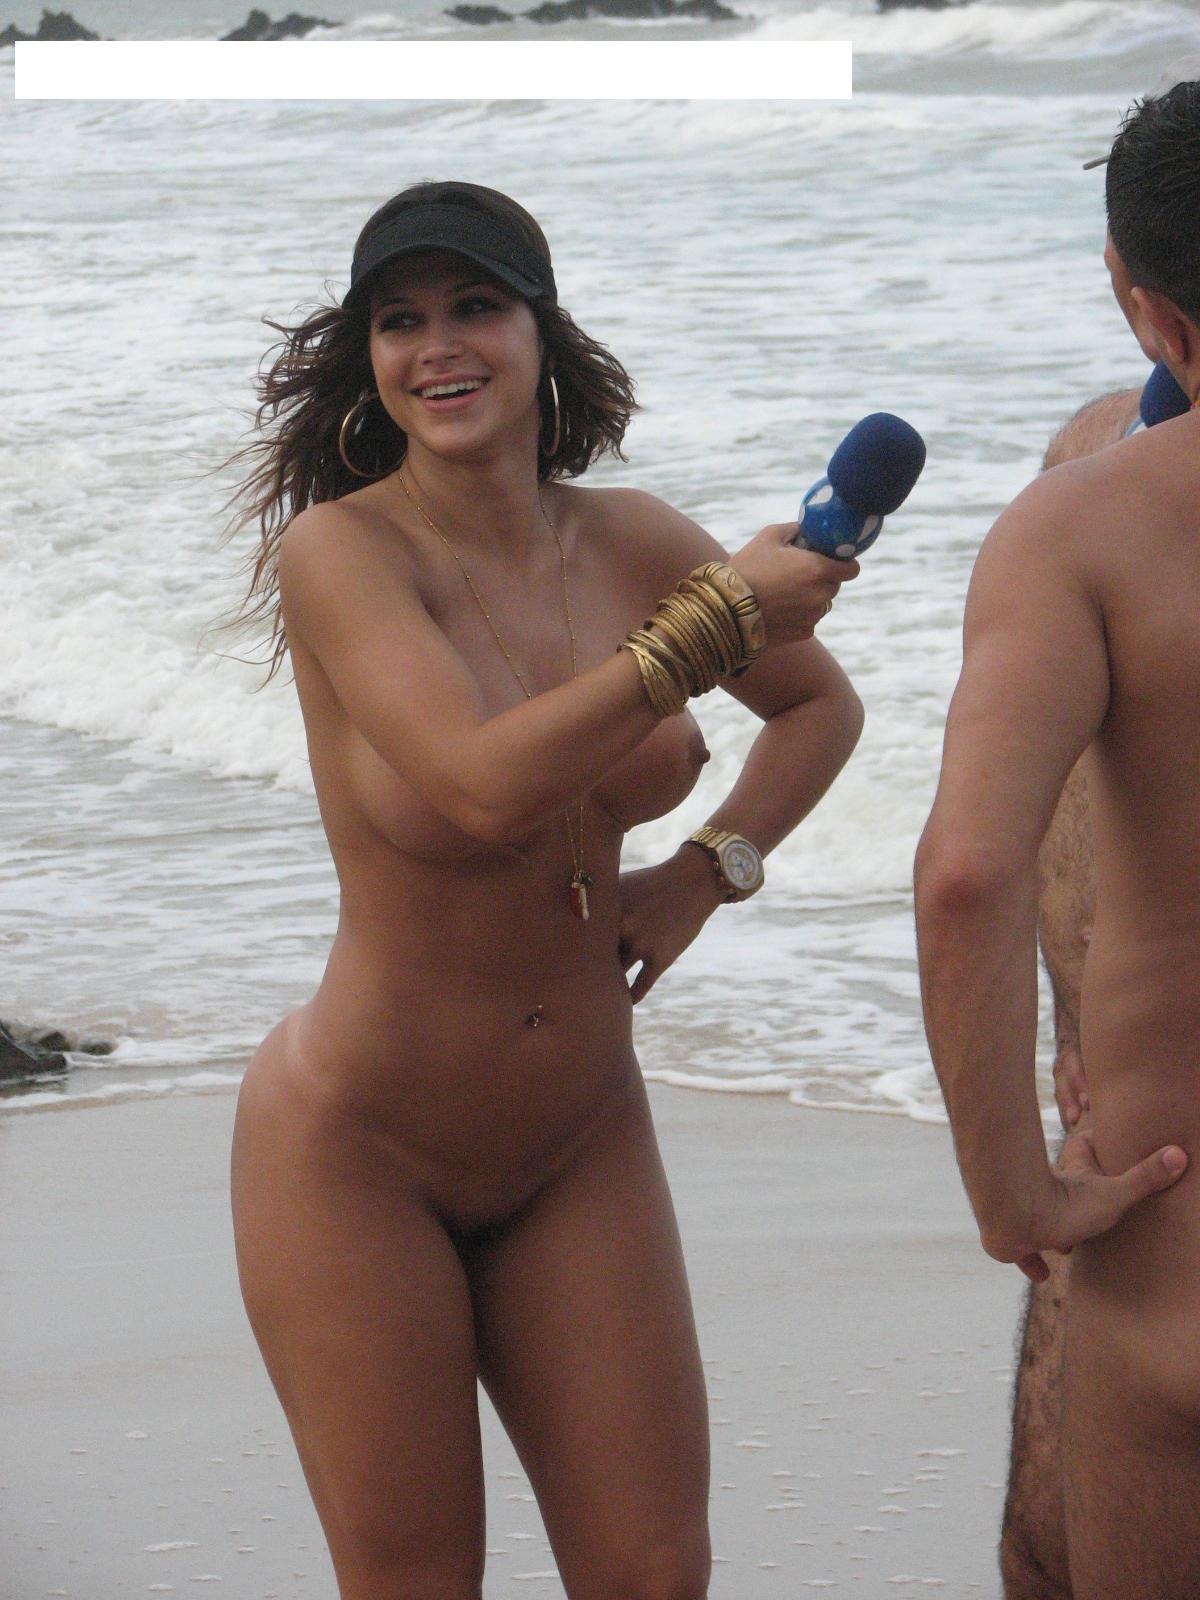 mulher samambaia pelada + maíra do bbb9